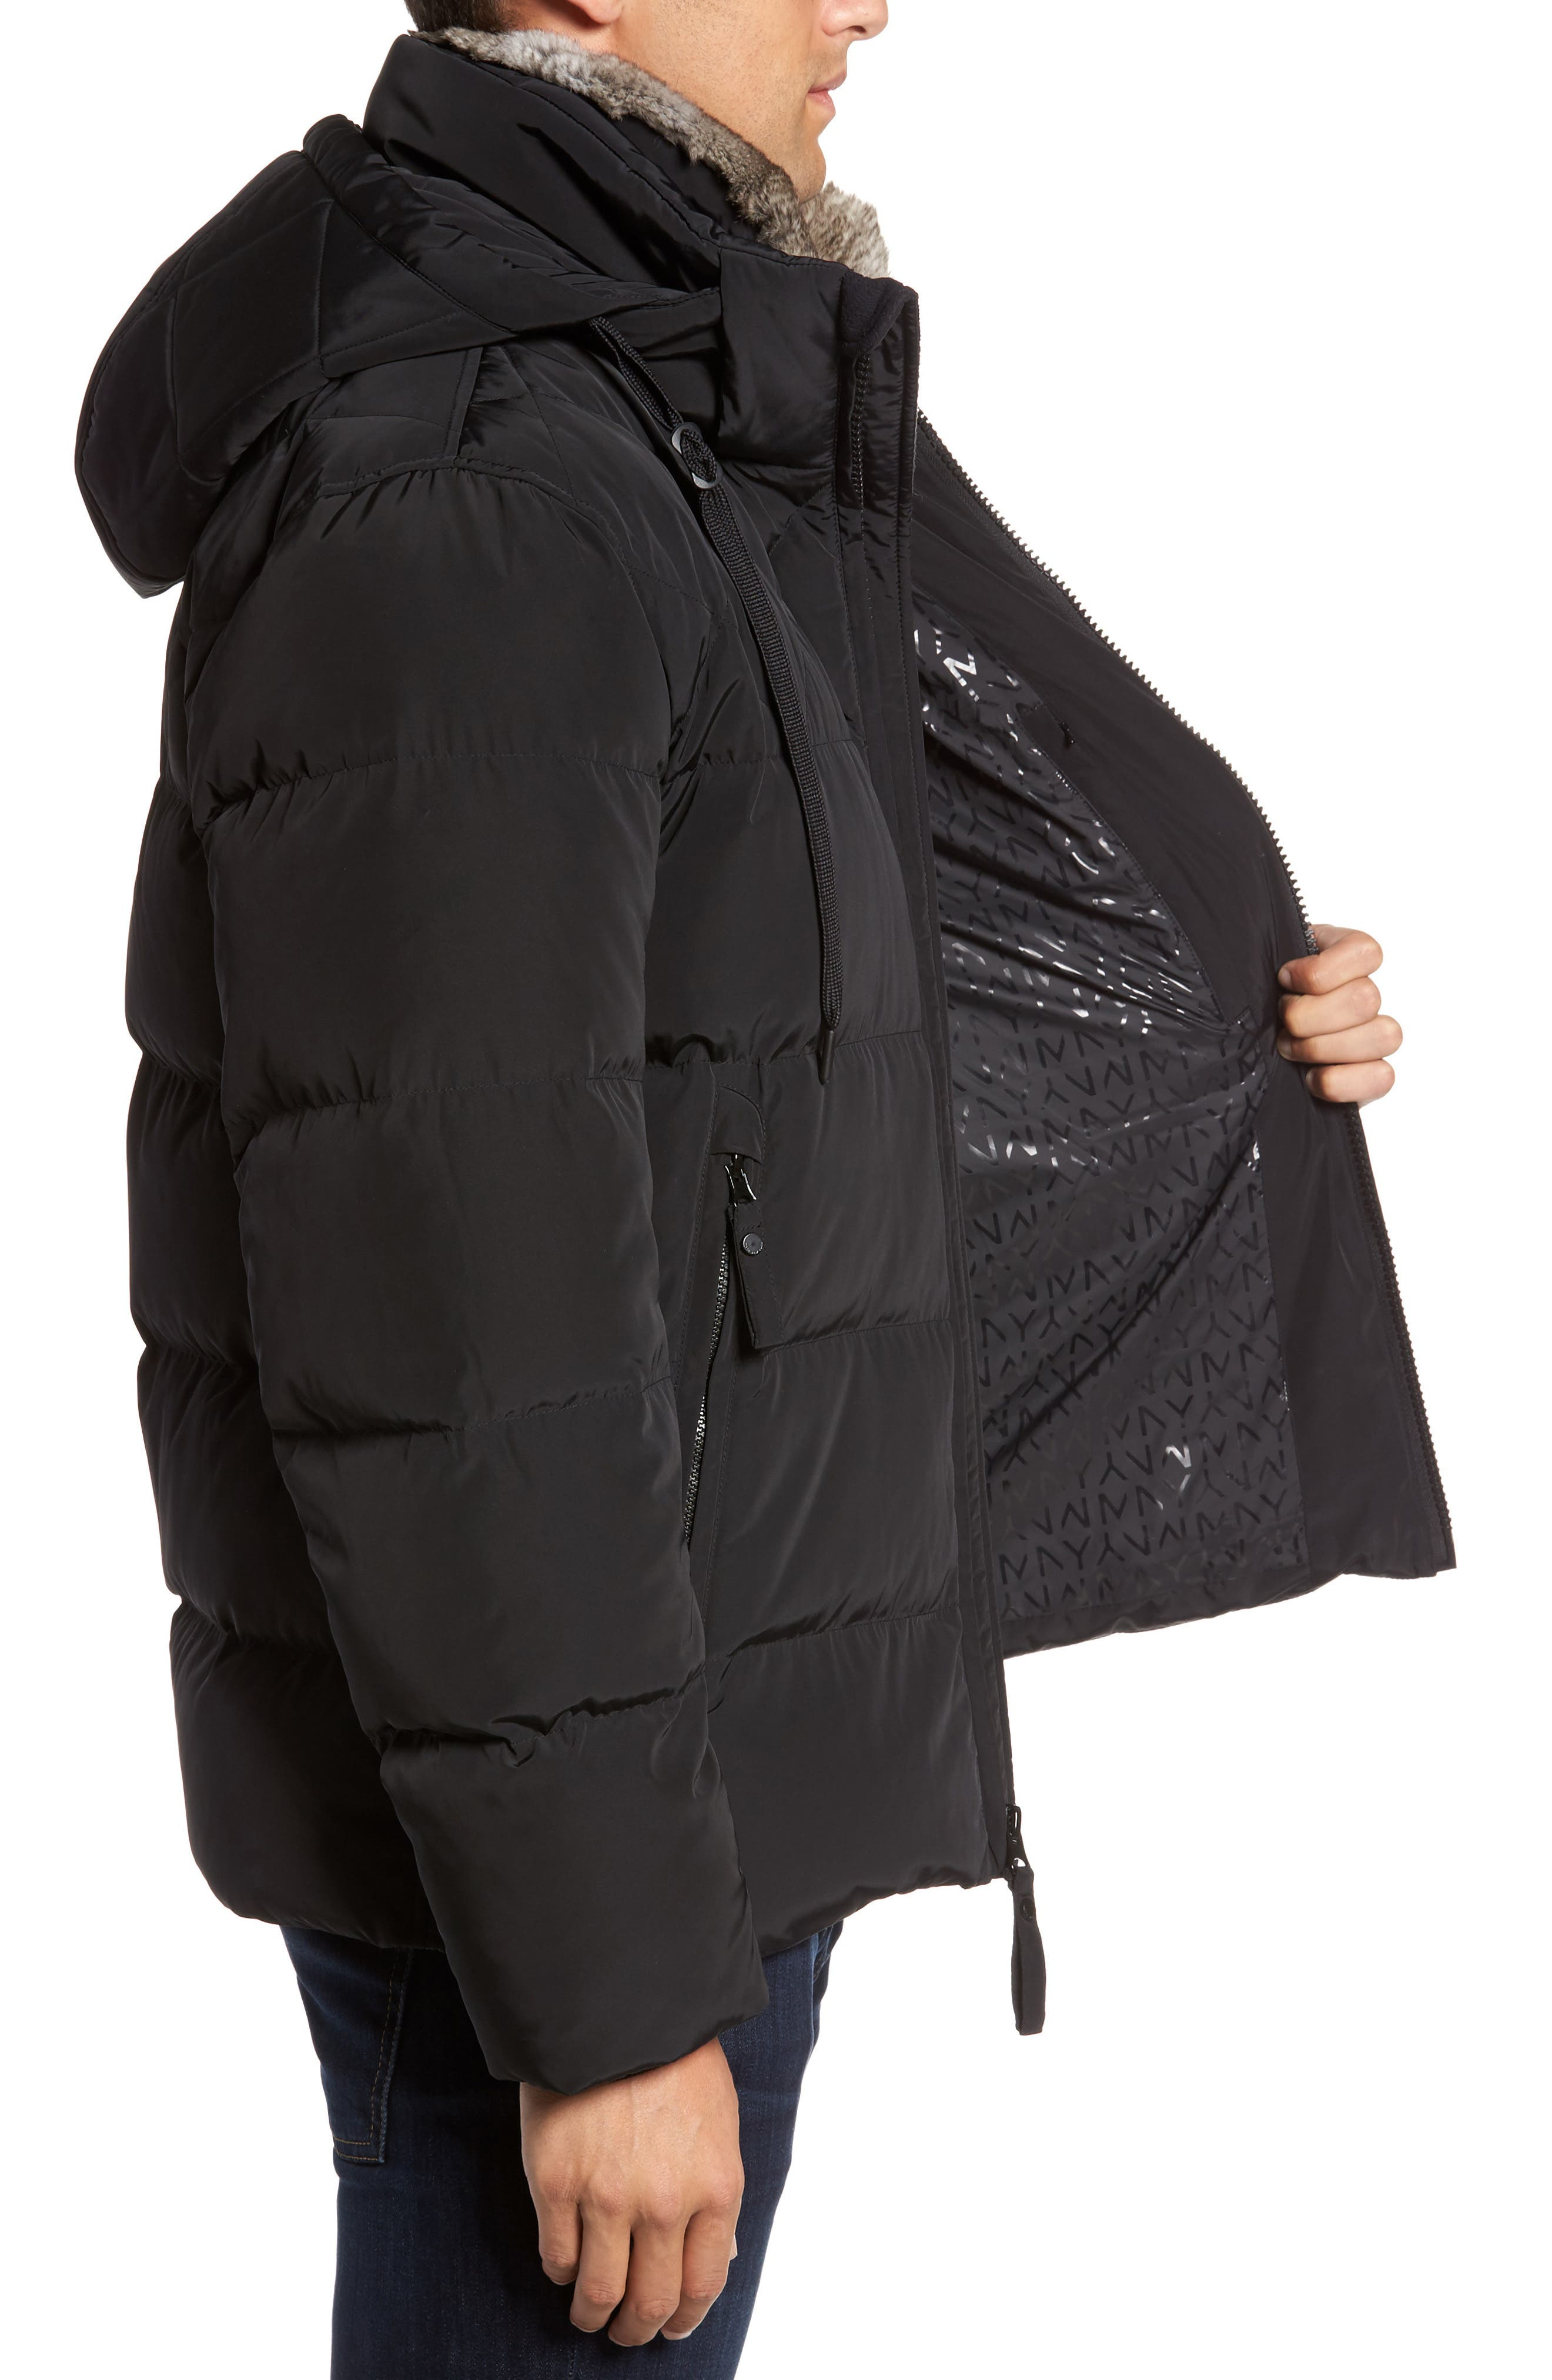 Navan Quilted Down Jacket with Genuine Rabbit Fur Trim,                             Alternate thumbnail 3, color,                             Black